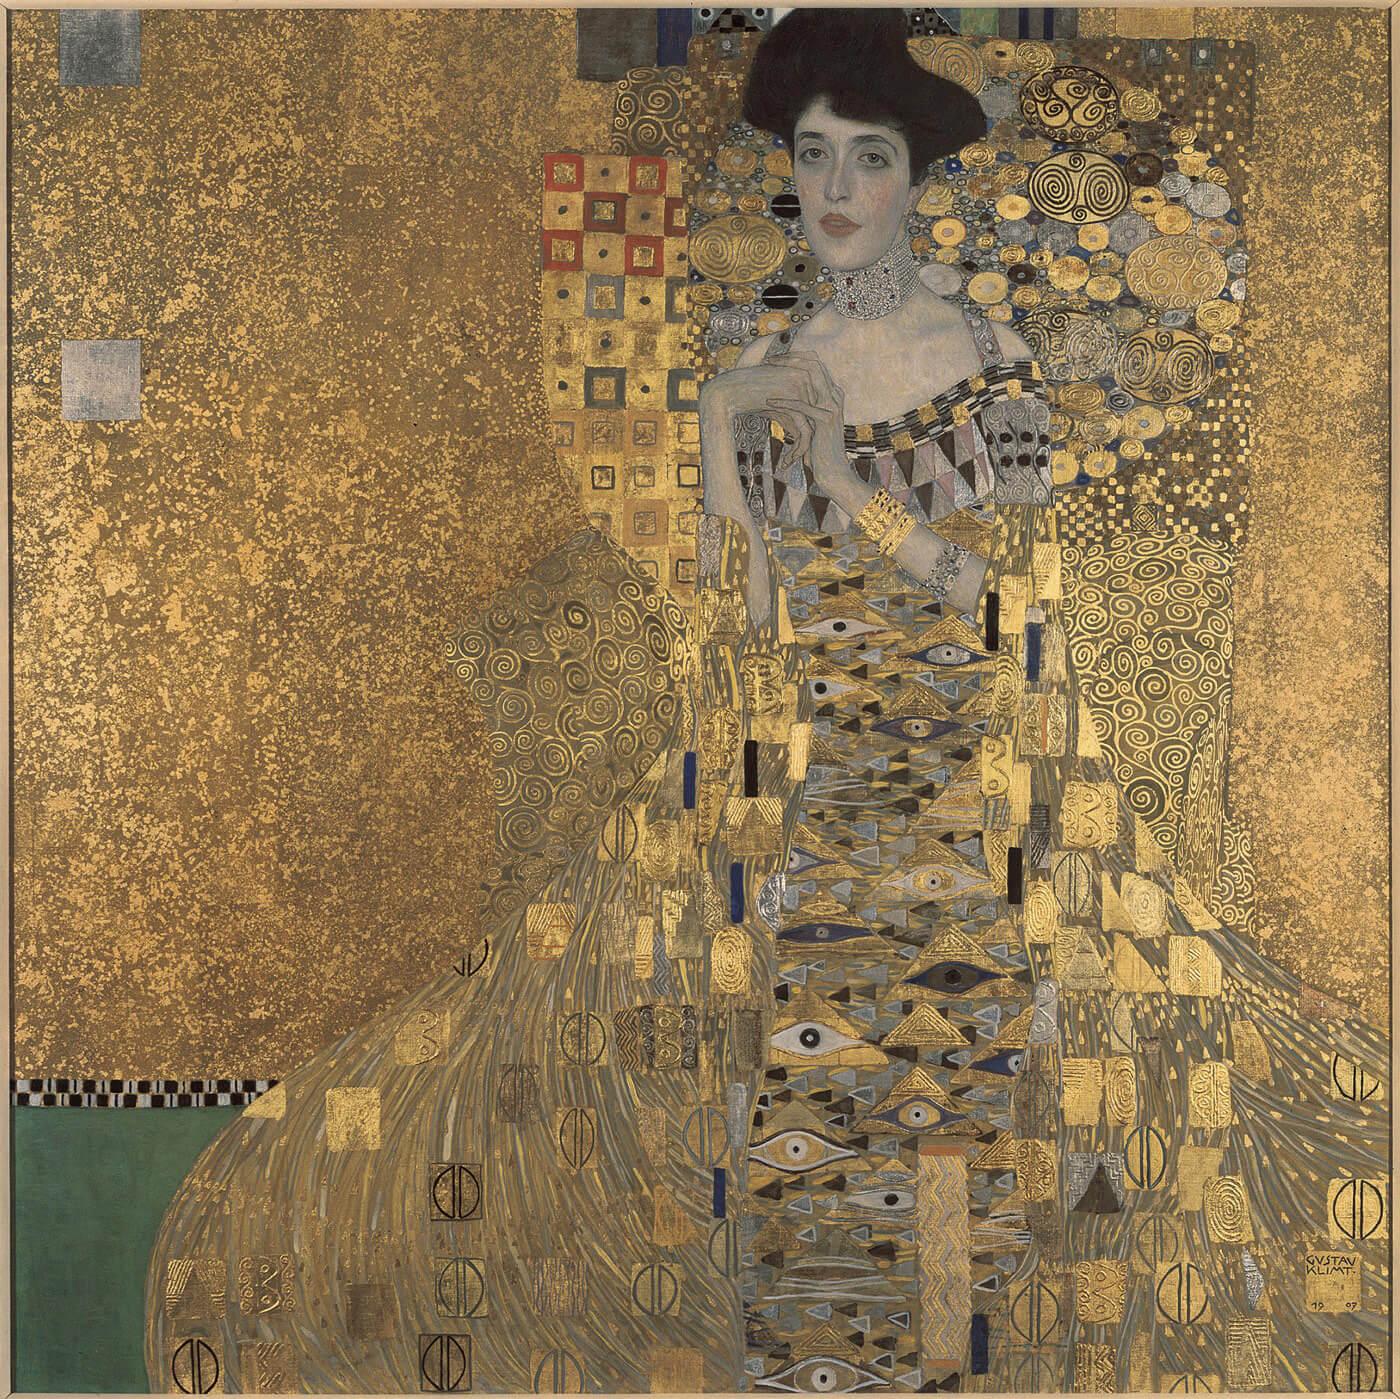 Gustav Klimt – Portrait of Adele Bloch-Bauer I